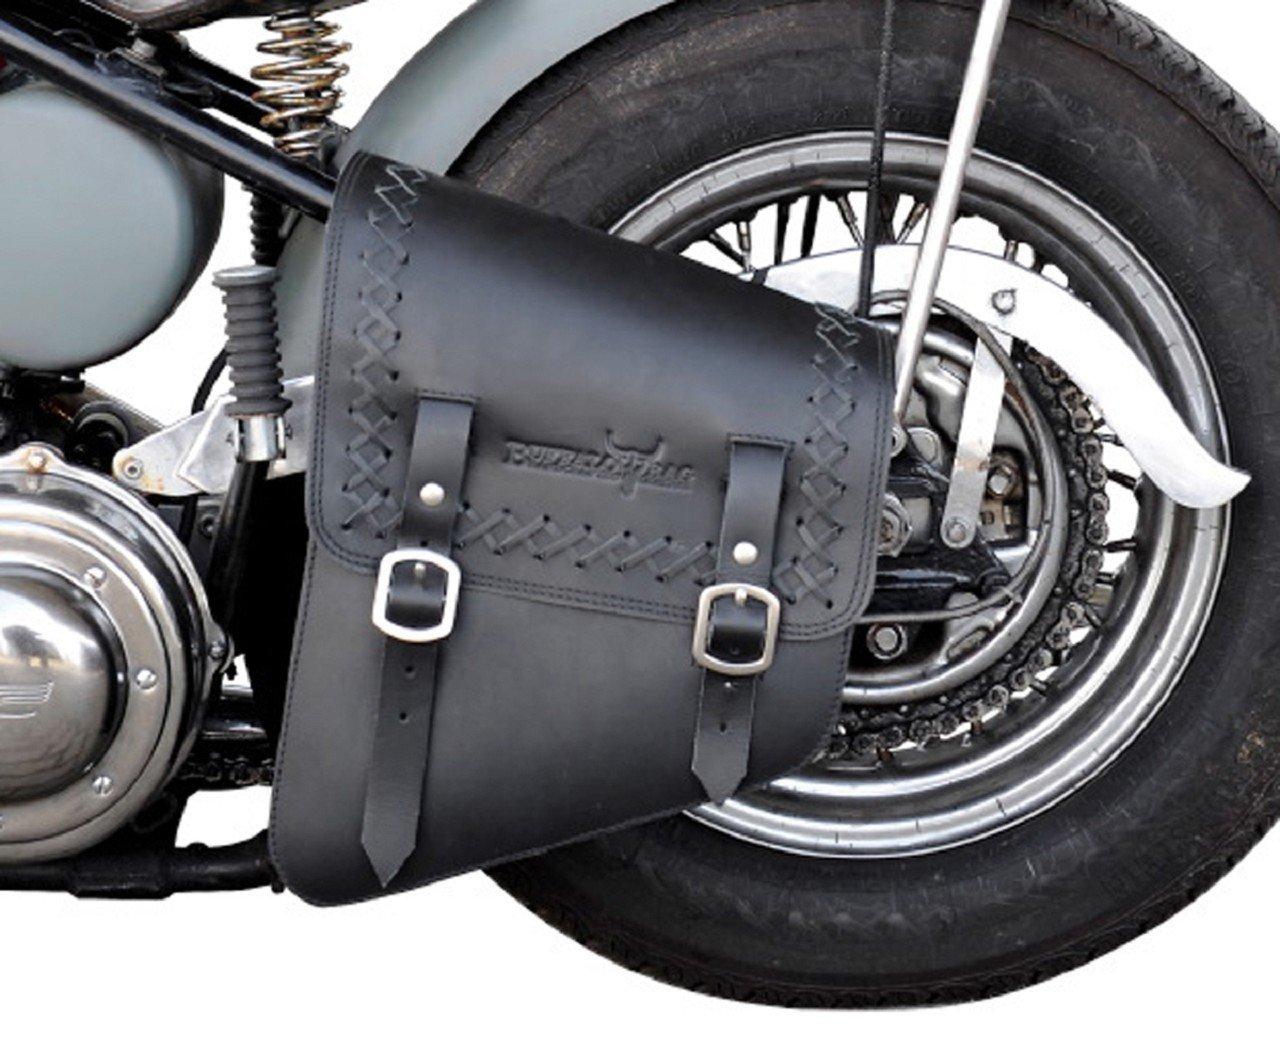 Rahmentasche 'Dallas' 11 Liter XL - schwarz linke Seite fü r Harley Davidson Softail z.B. Heritage, Springer, Night Train, Slim Buffalo Bag